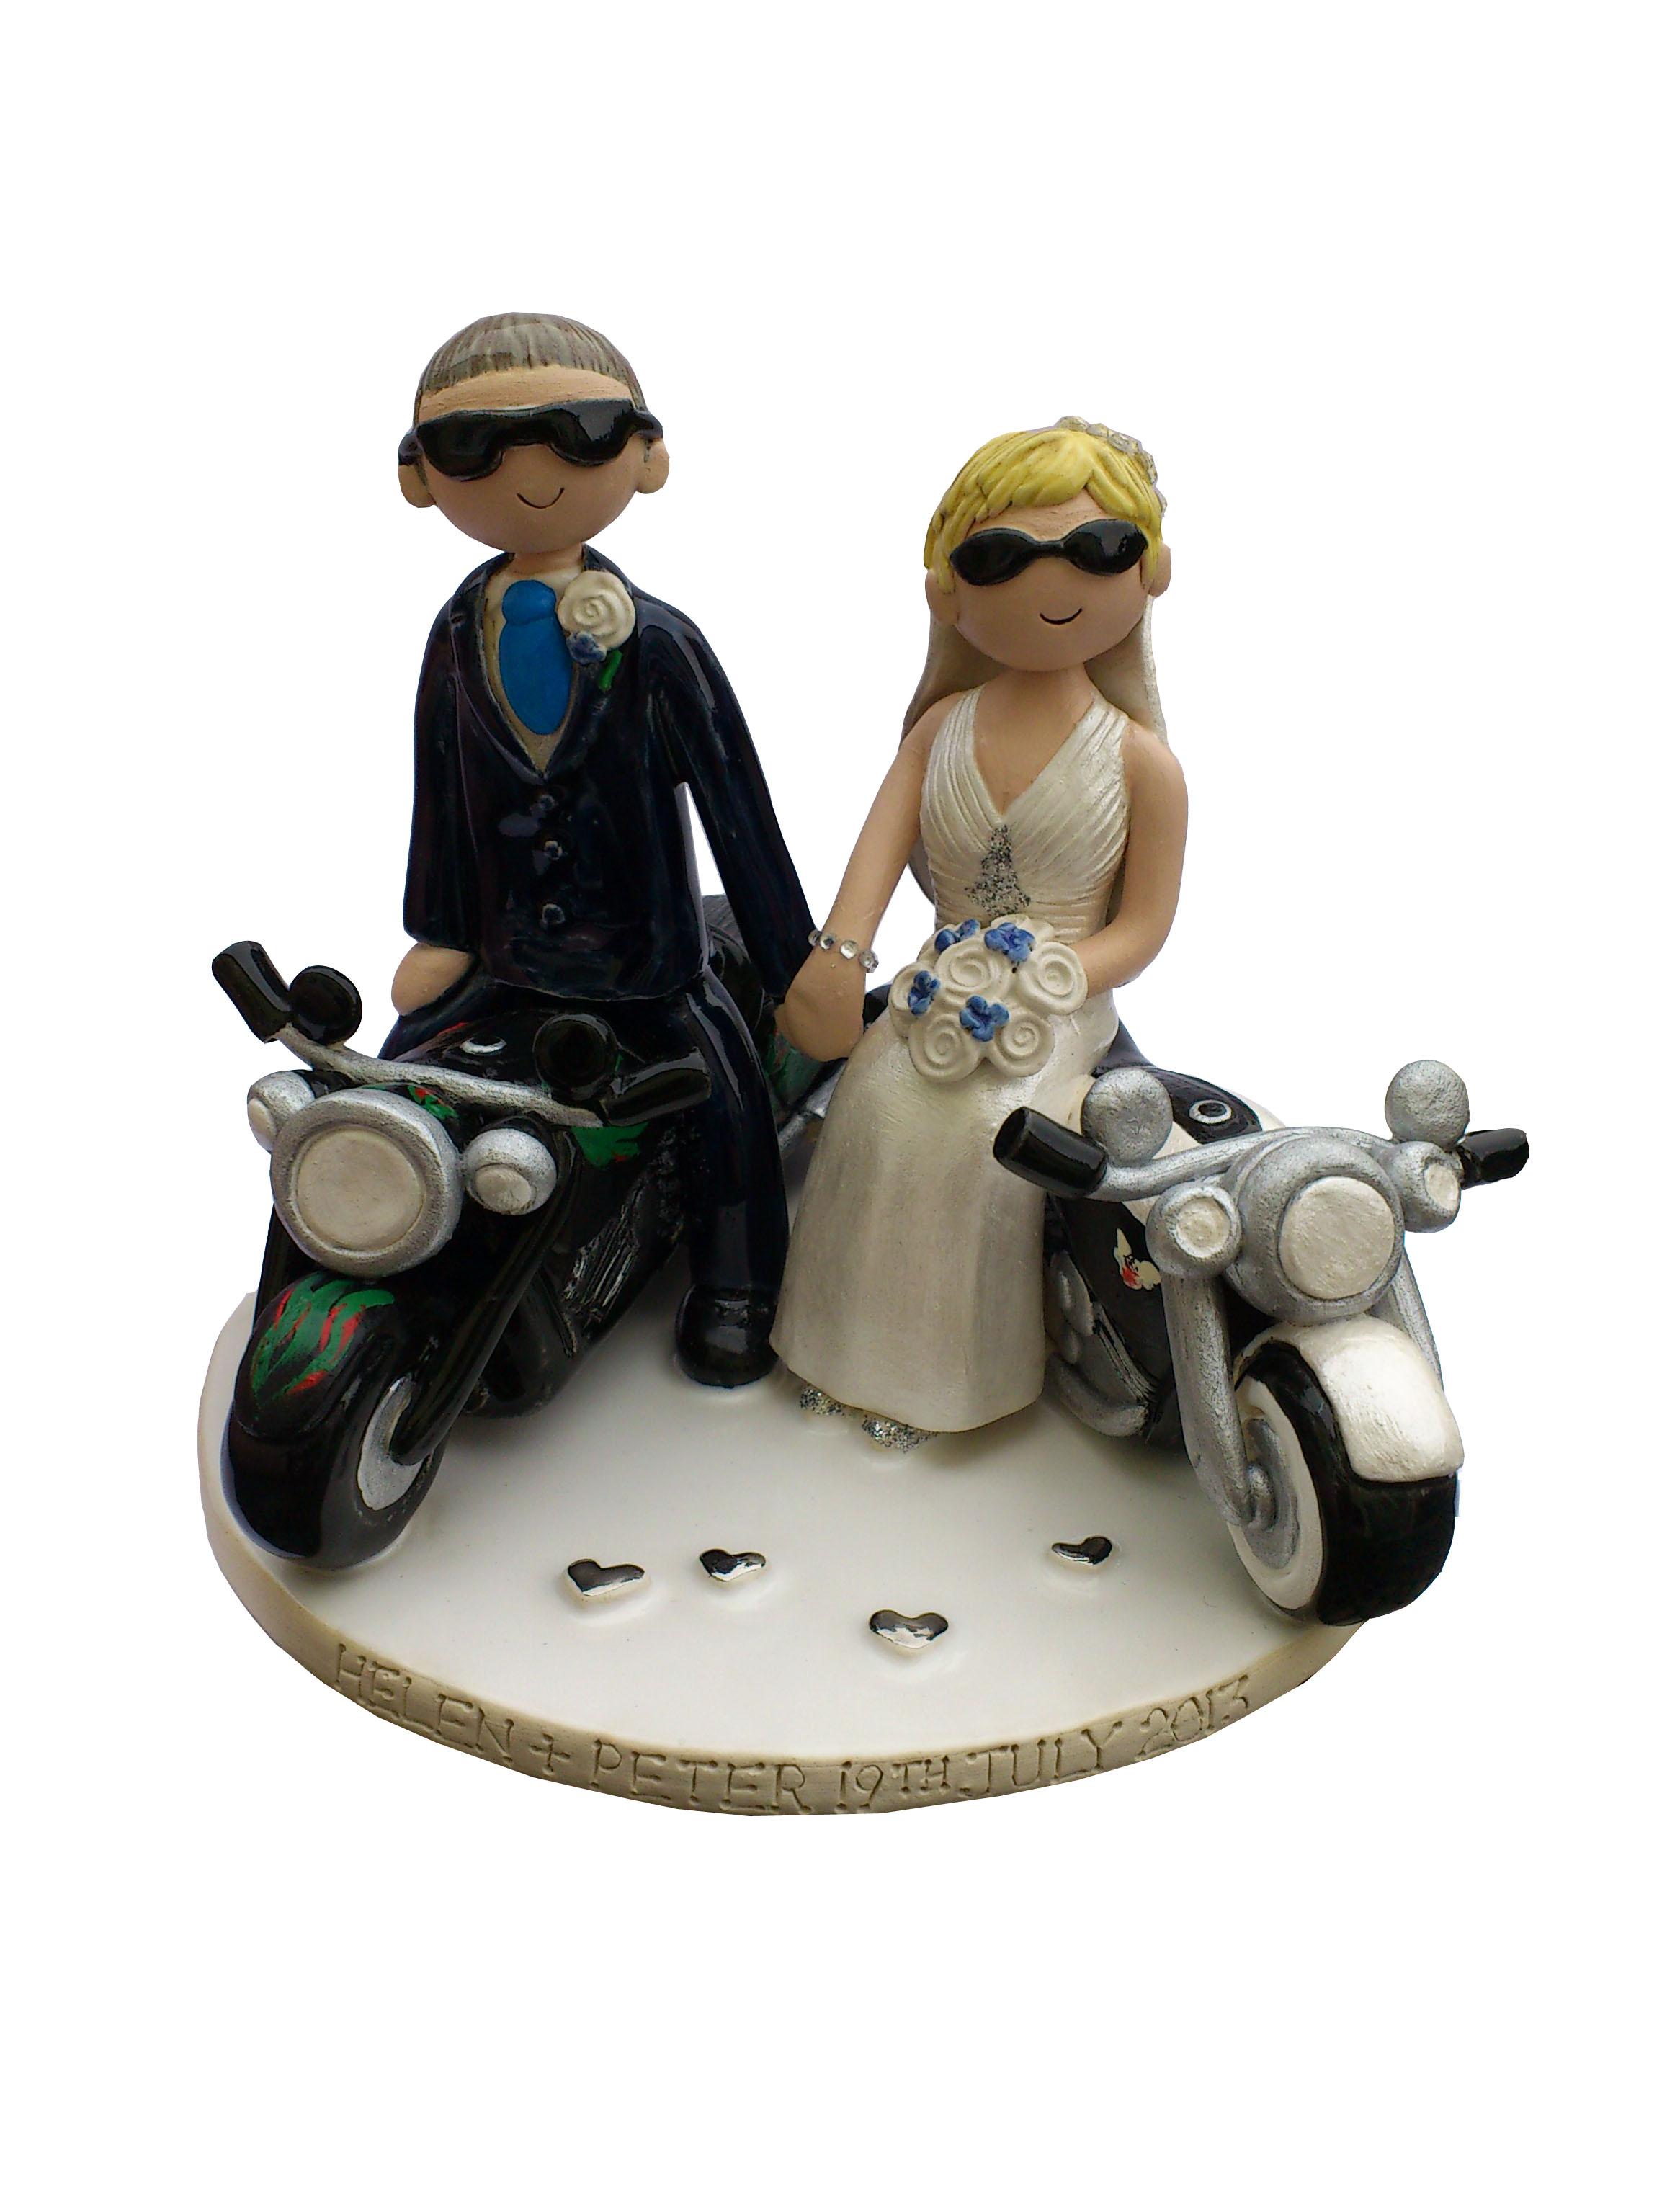 Motorbike Cake Top